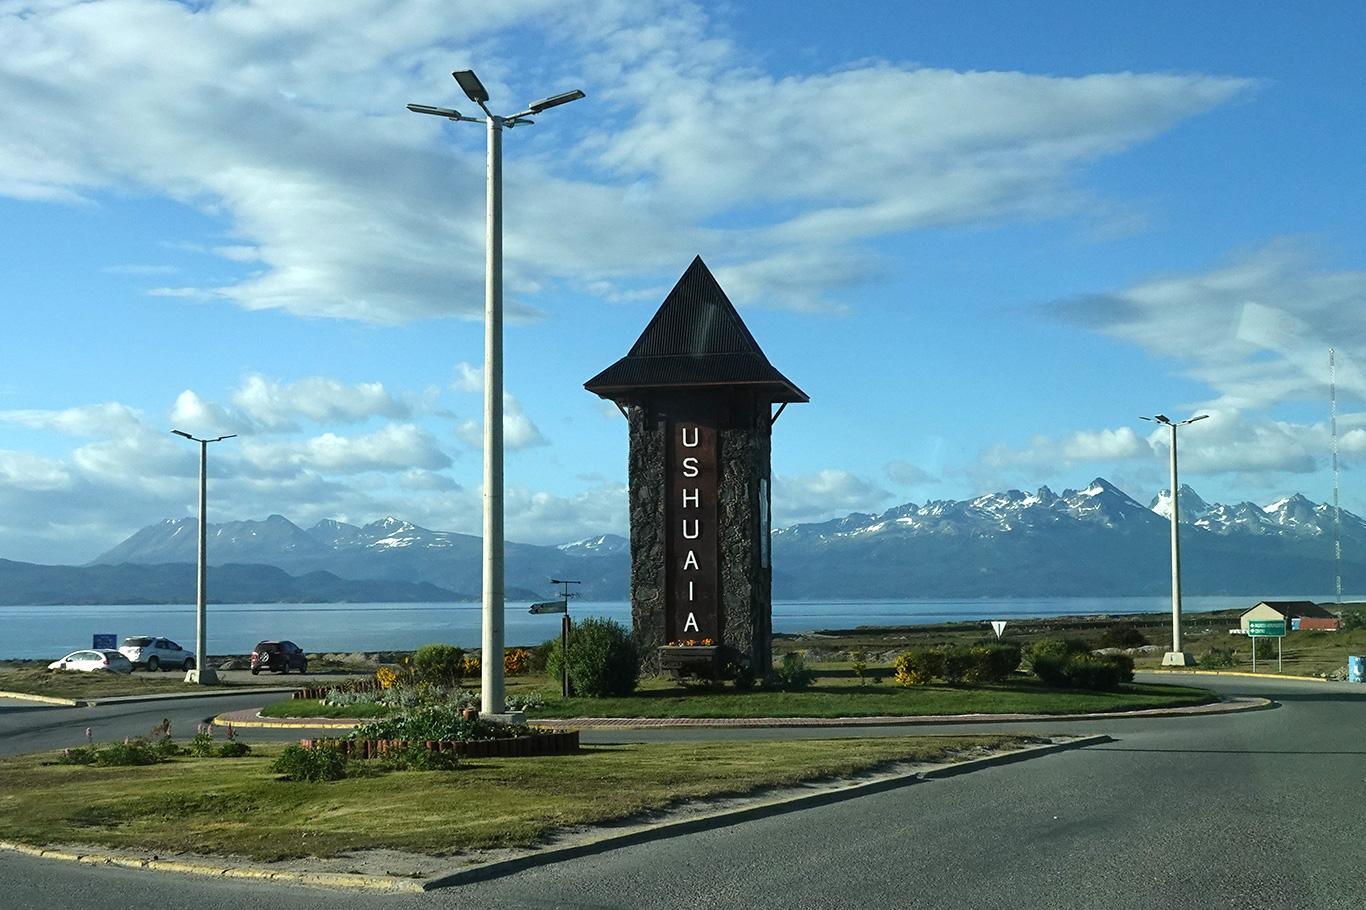 View of Ushuaia, Ushuaia, Argentina.